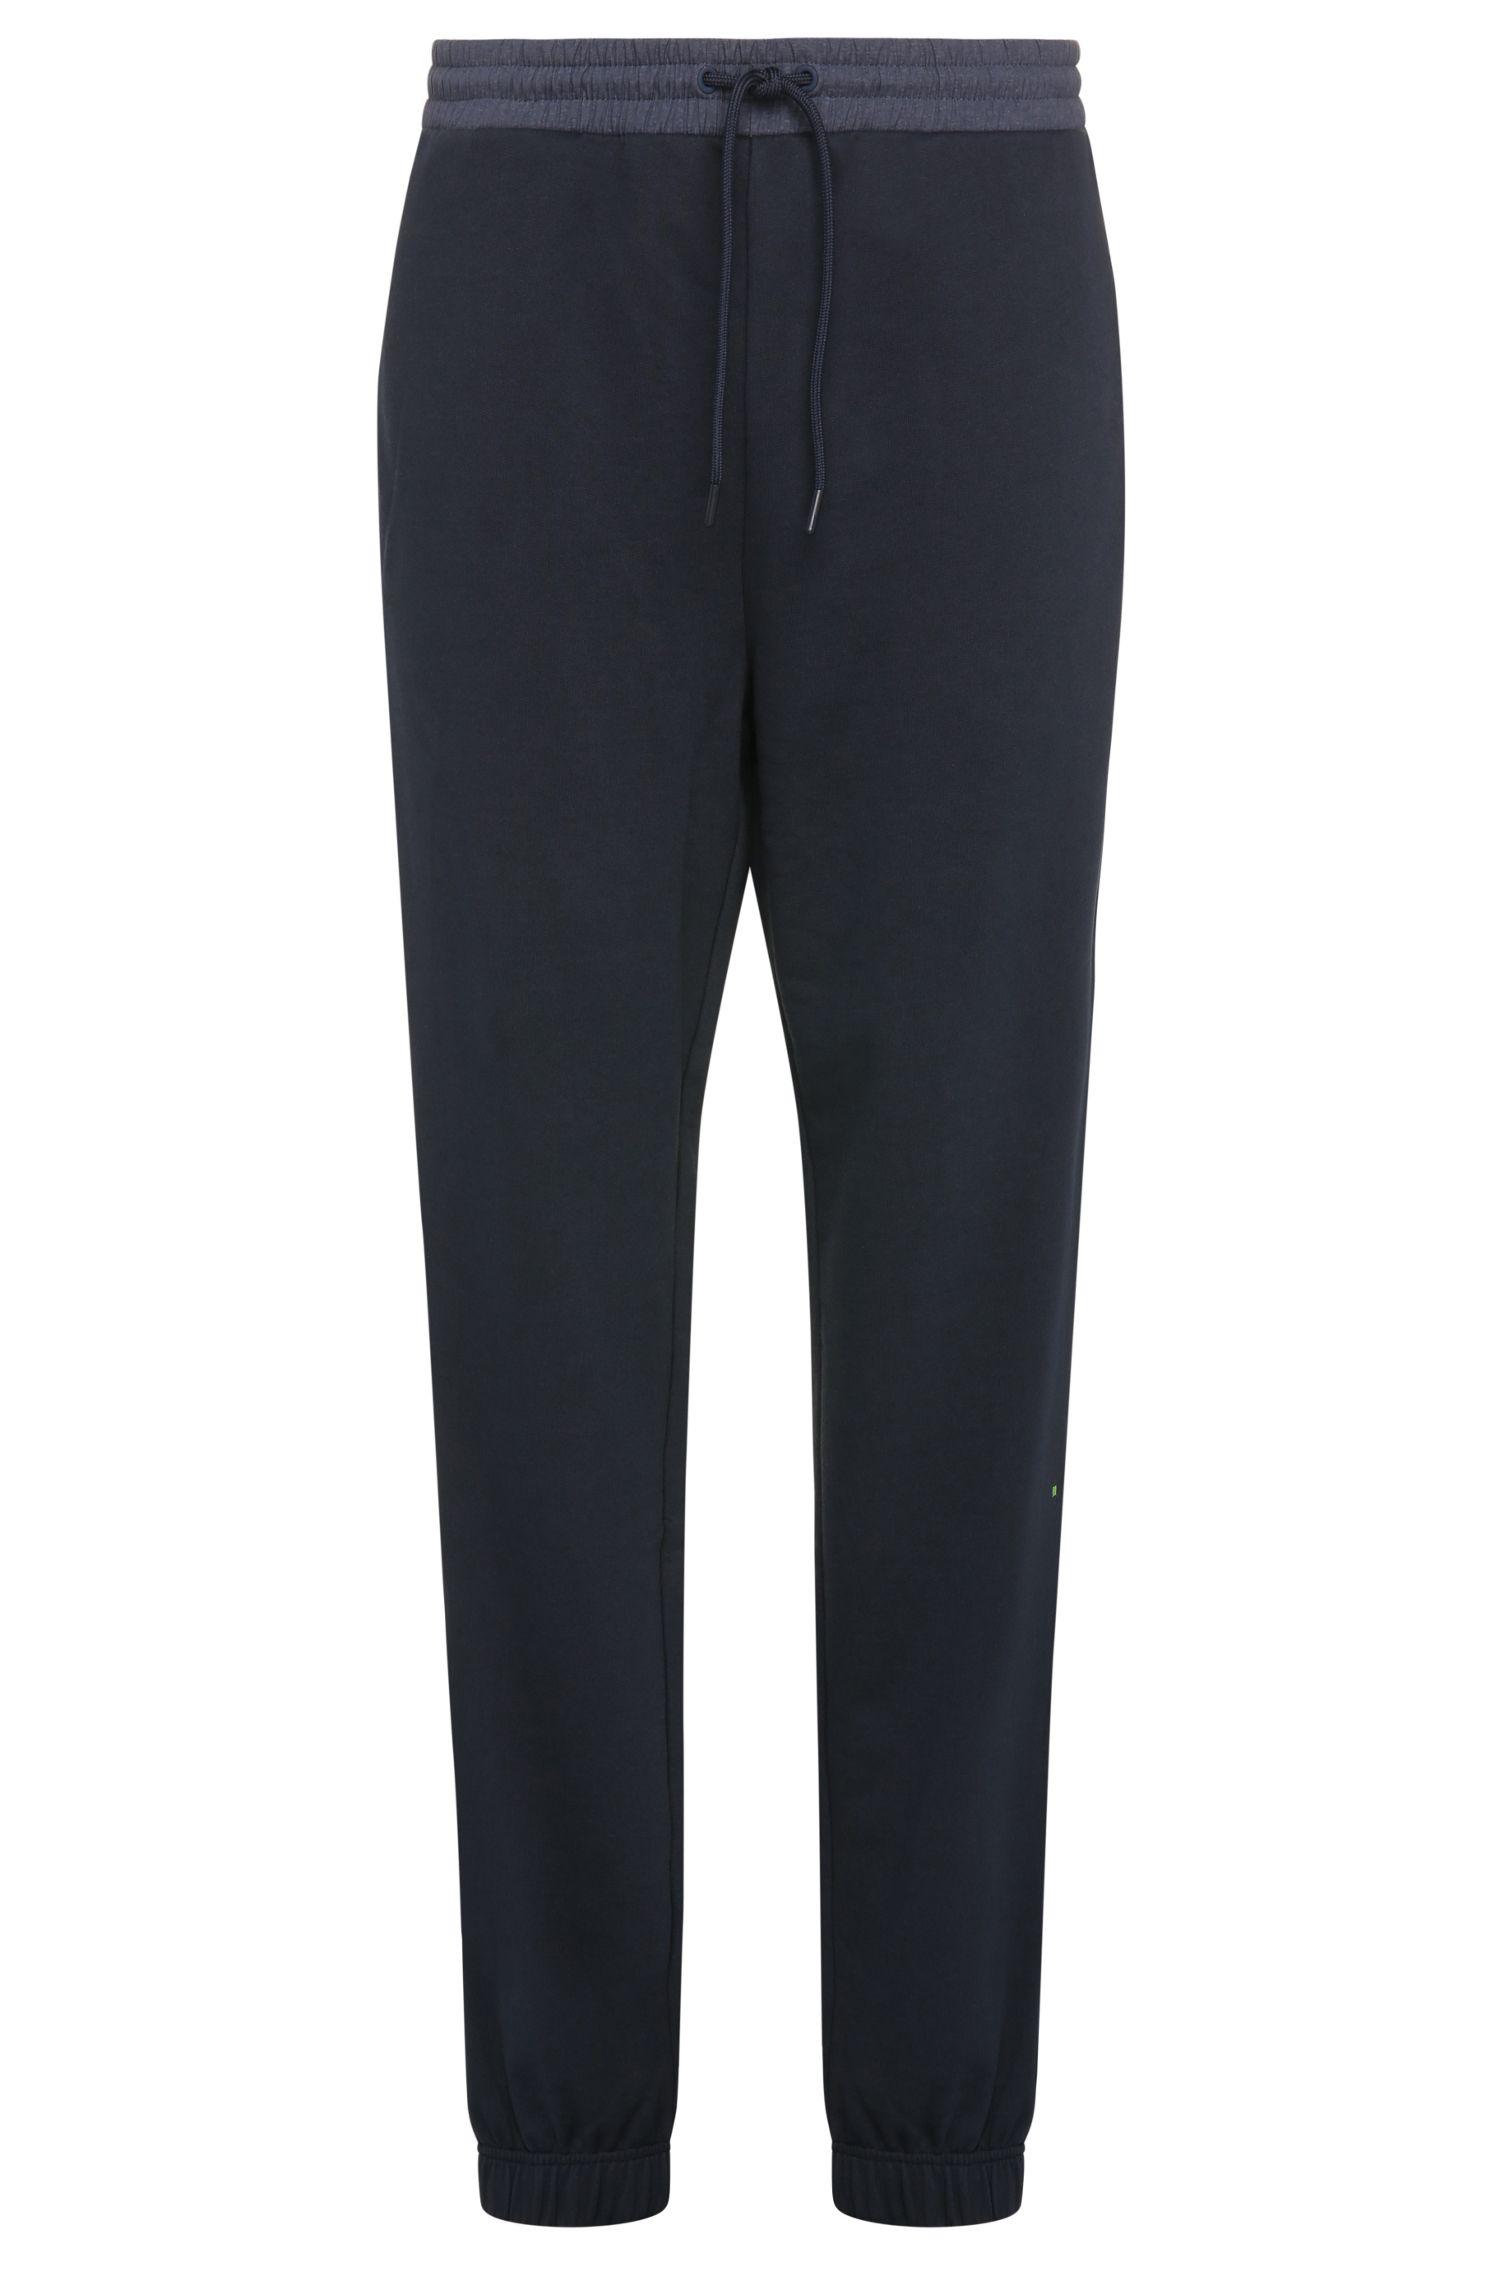 'Hivon' | Cotton Drawstring Track Pants